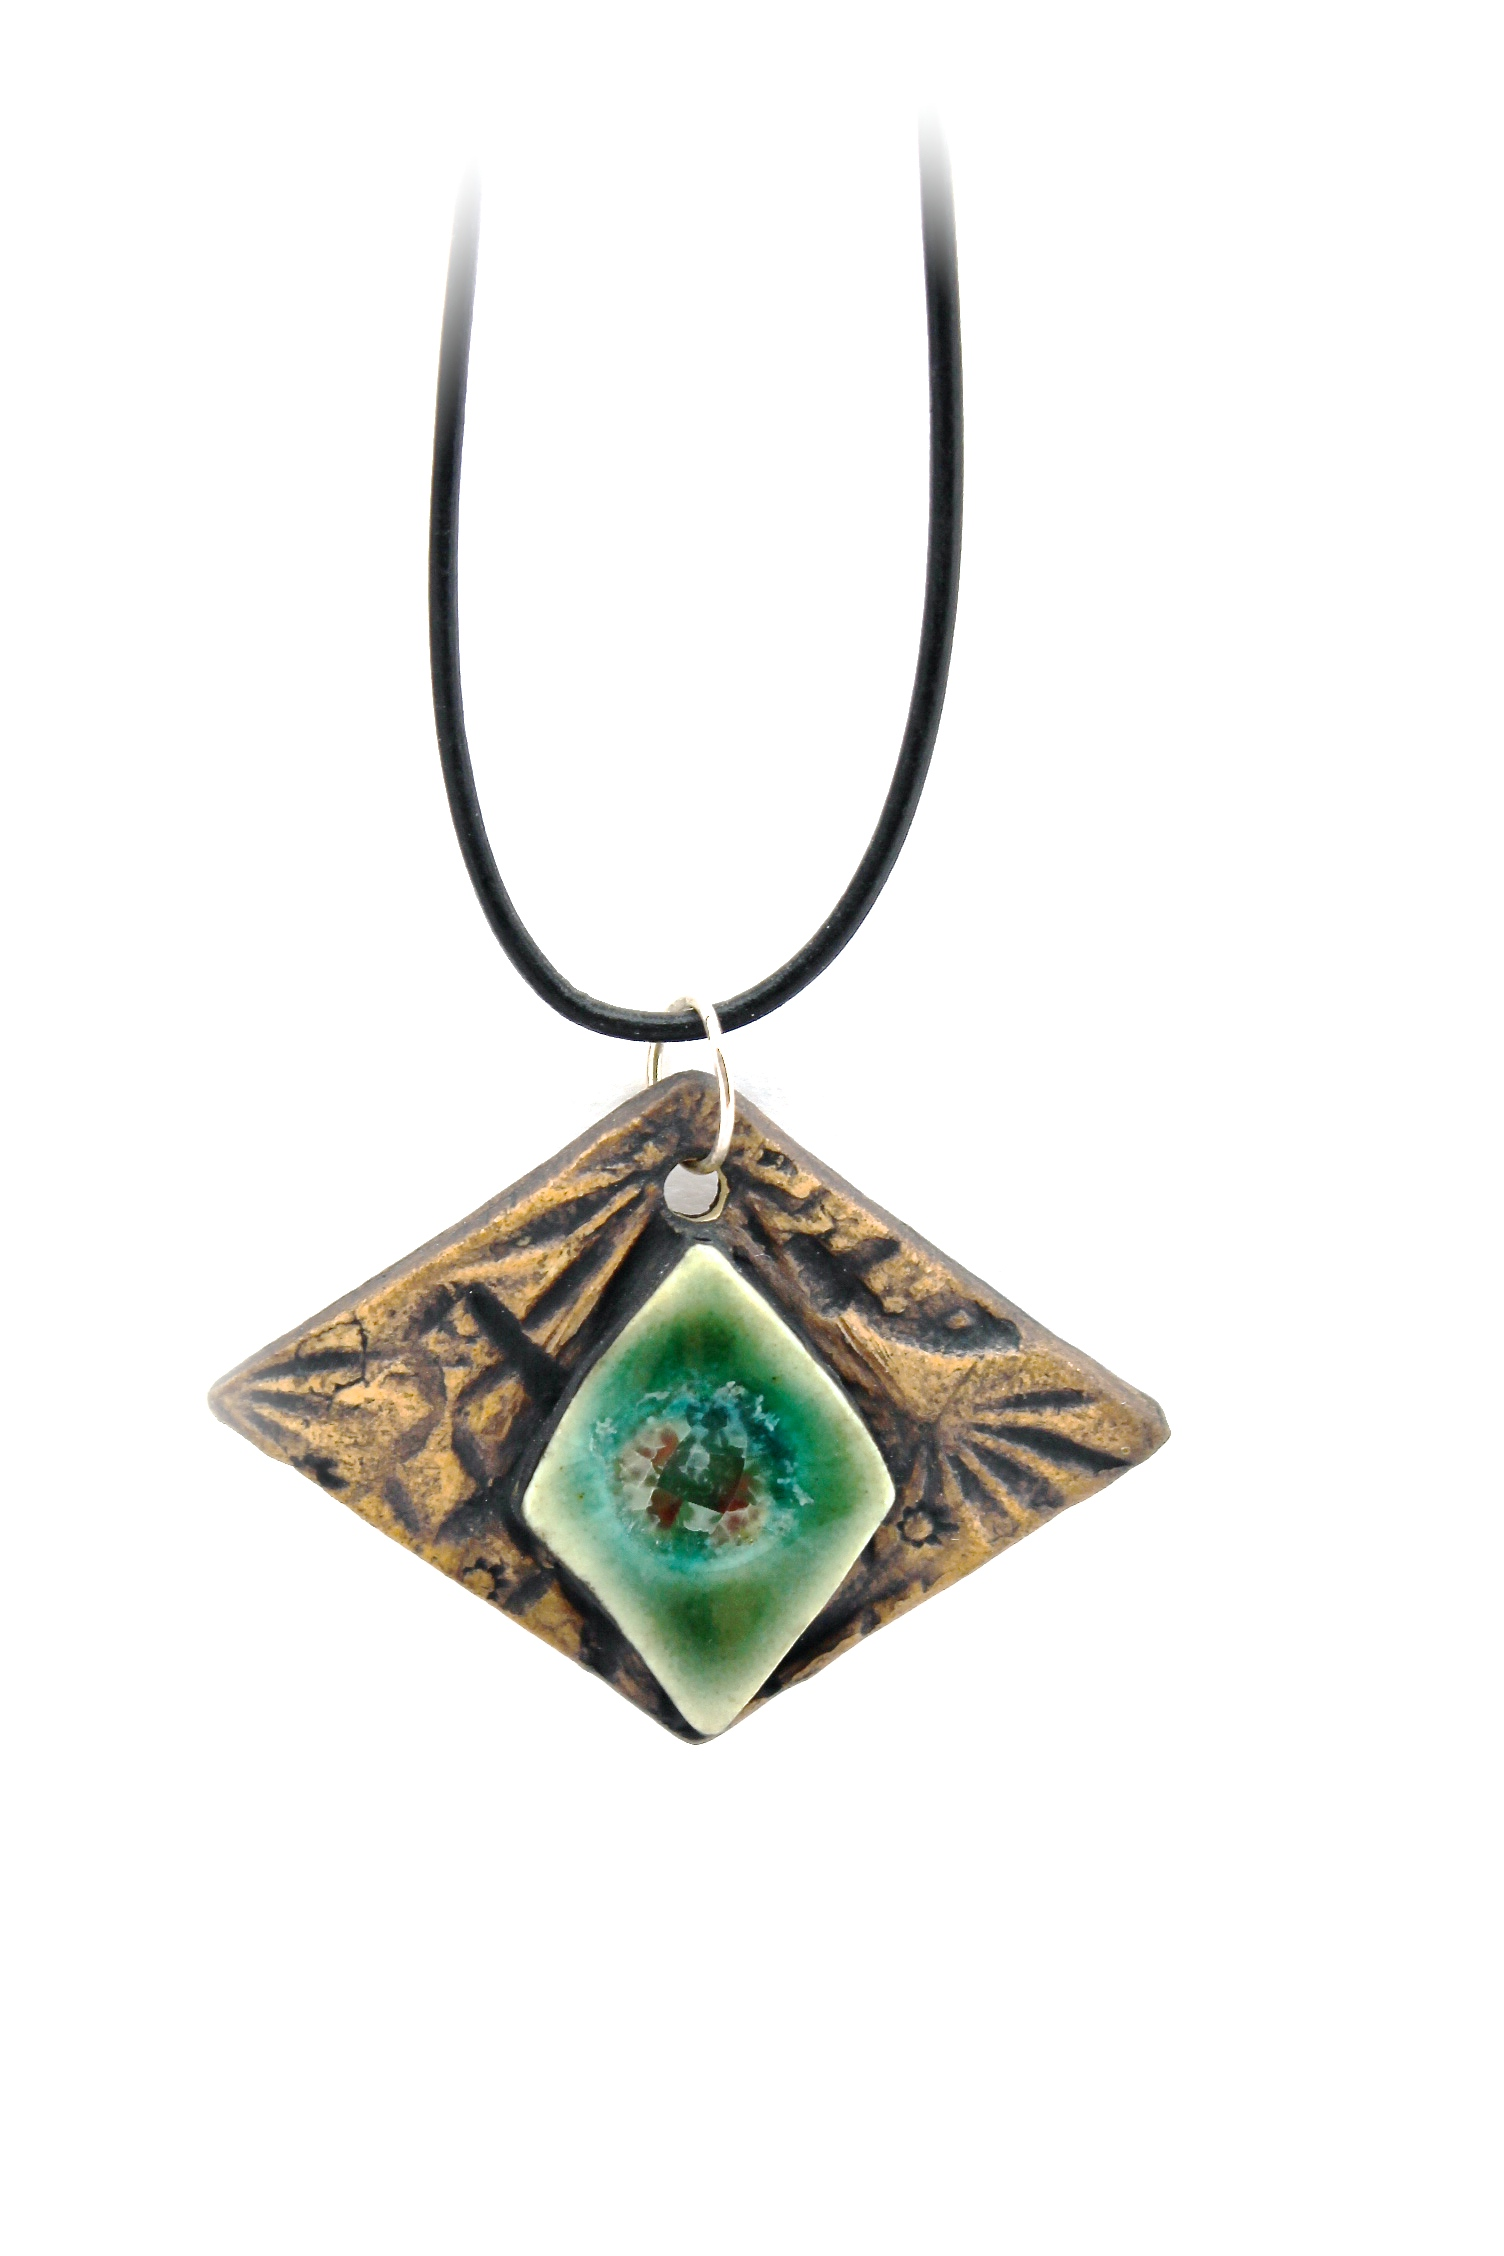 Ceramic + Melted Glass Pendants #18